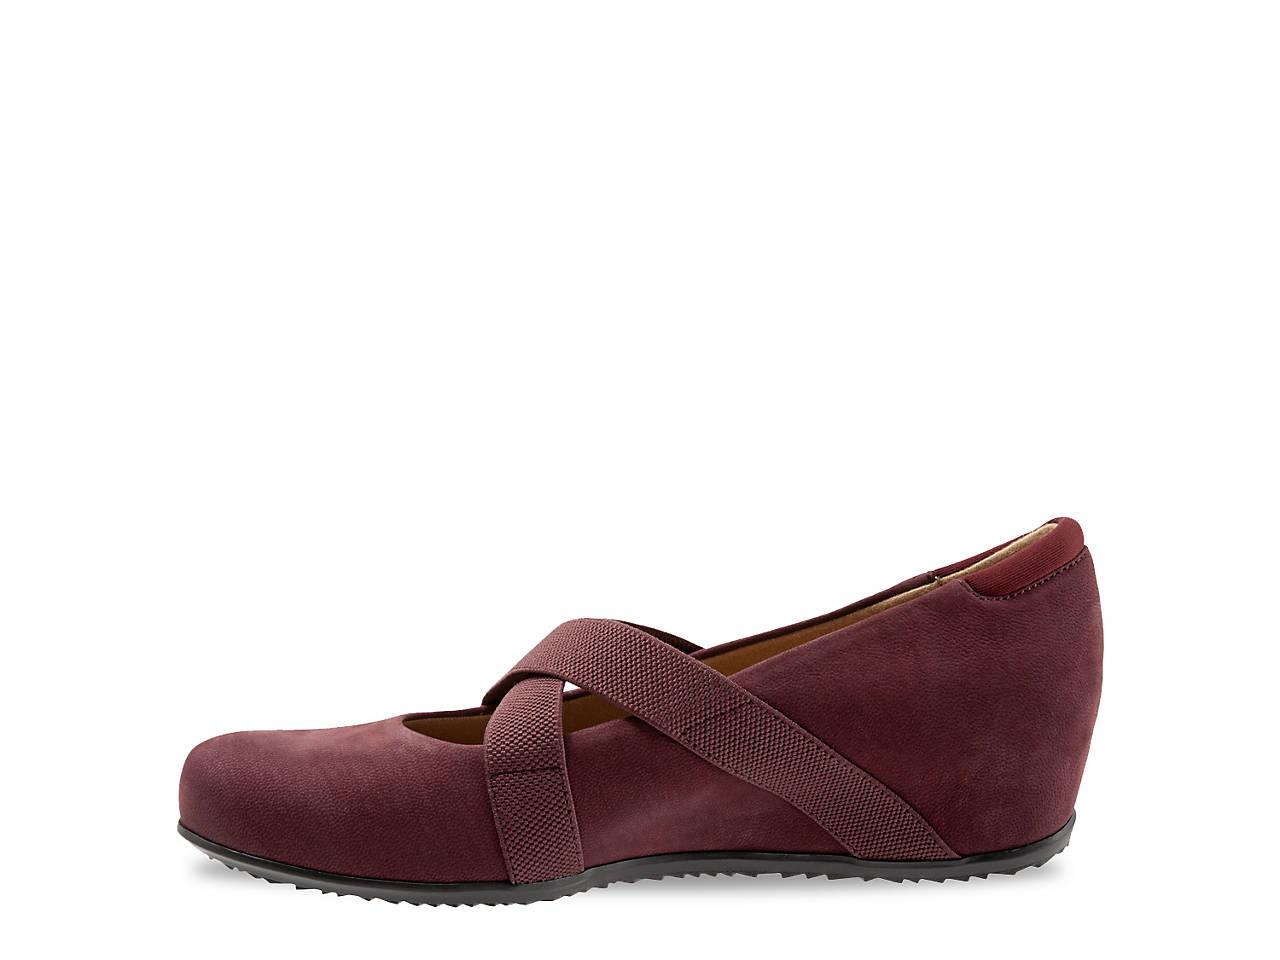 e61c5732f82 Softwalk Waverly Wedge Slip-On Women s Shoes